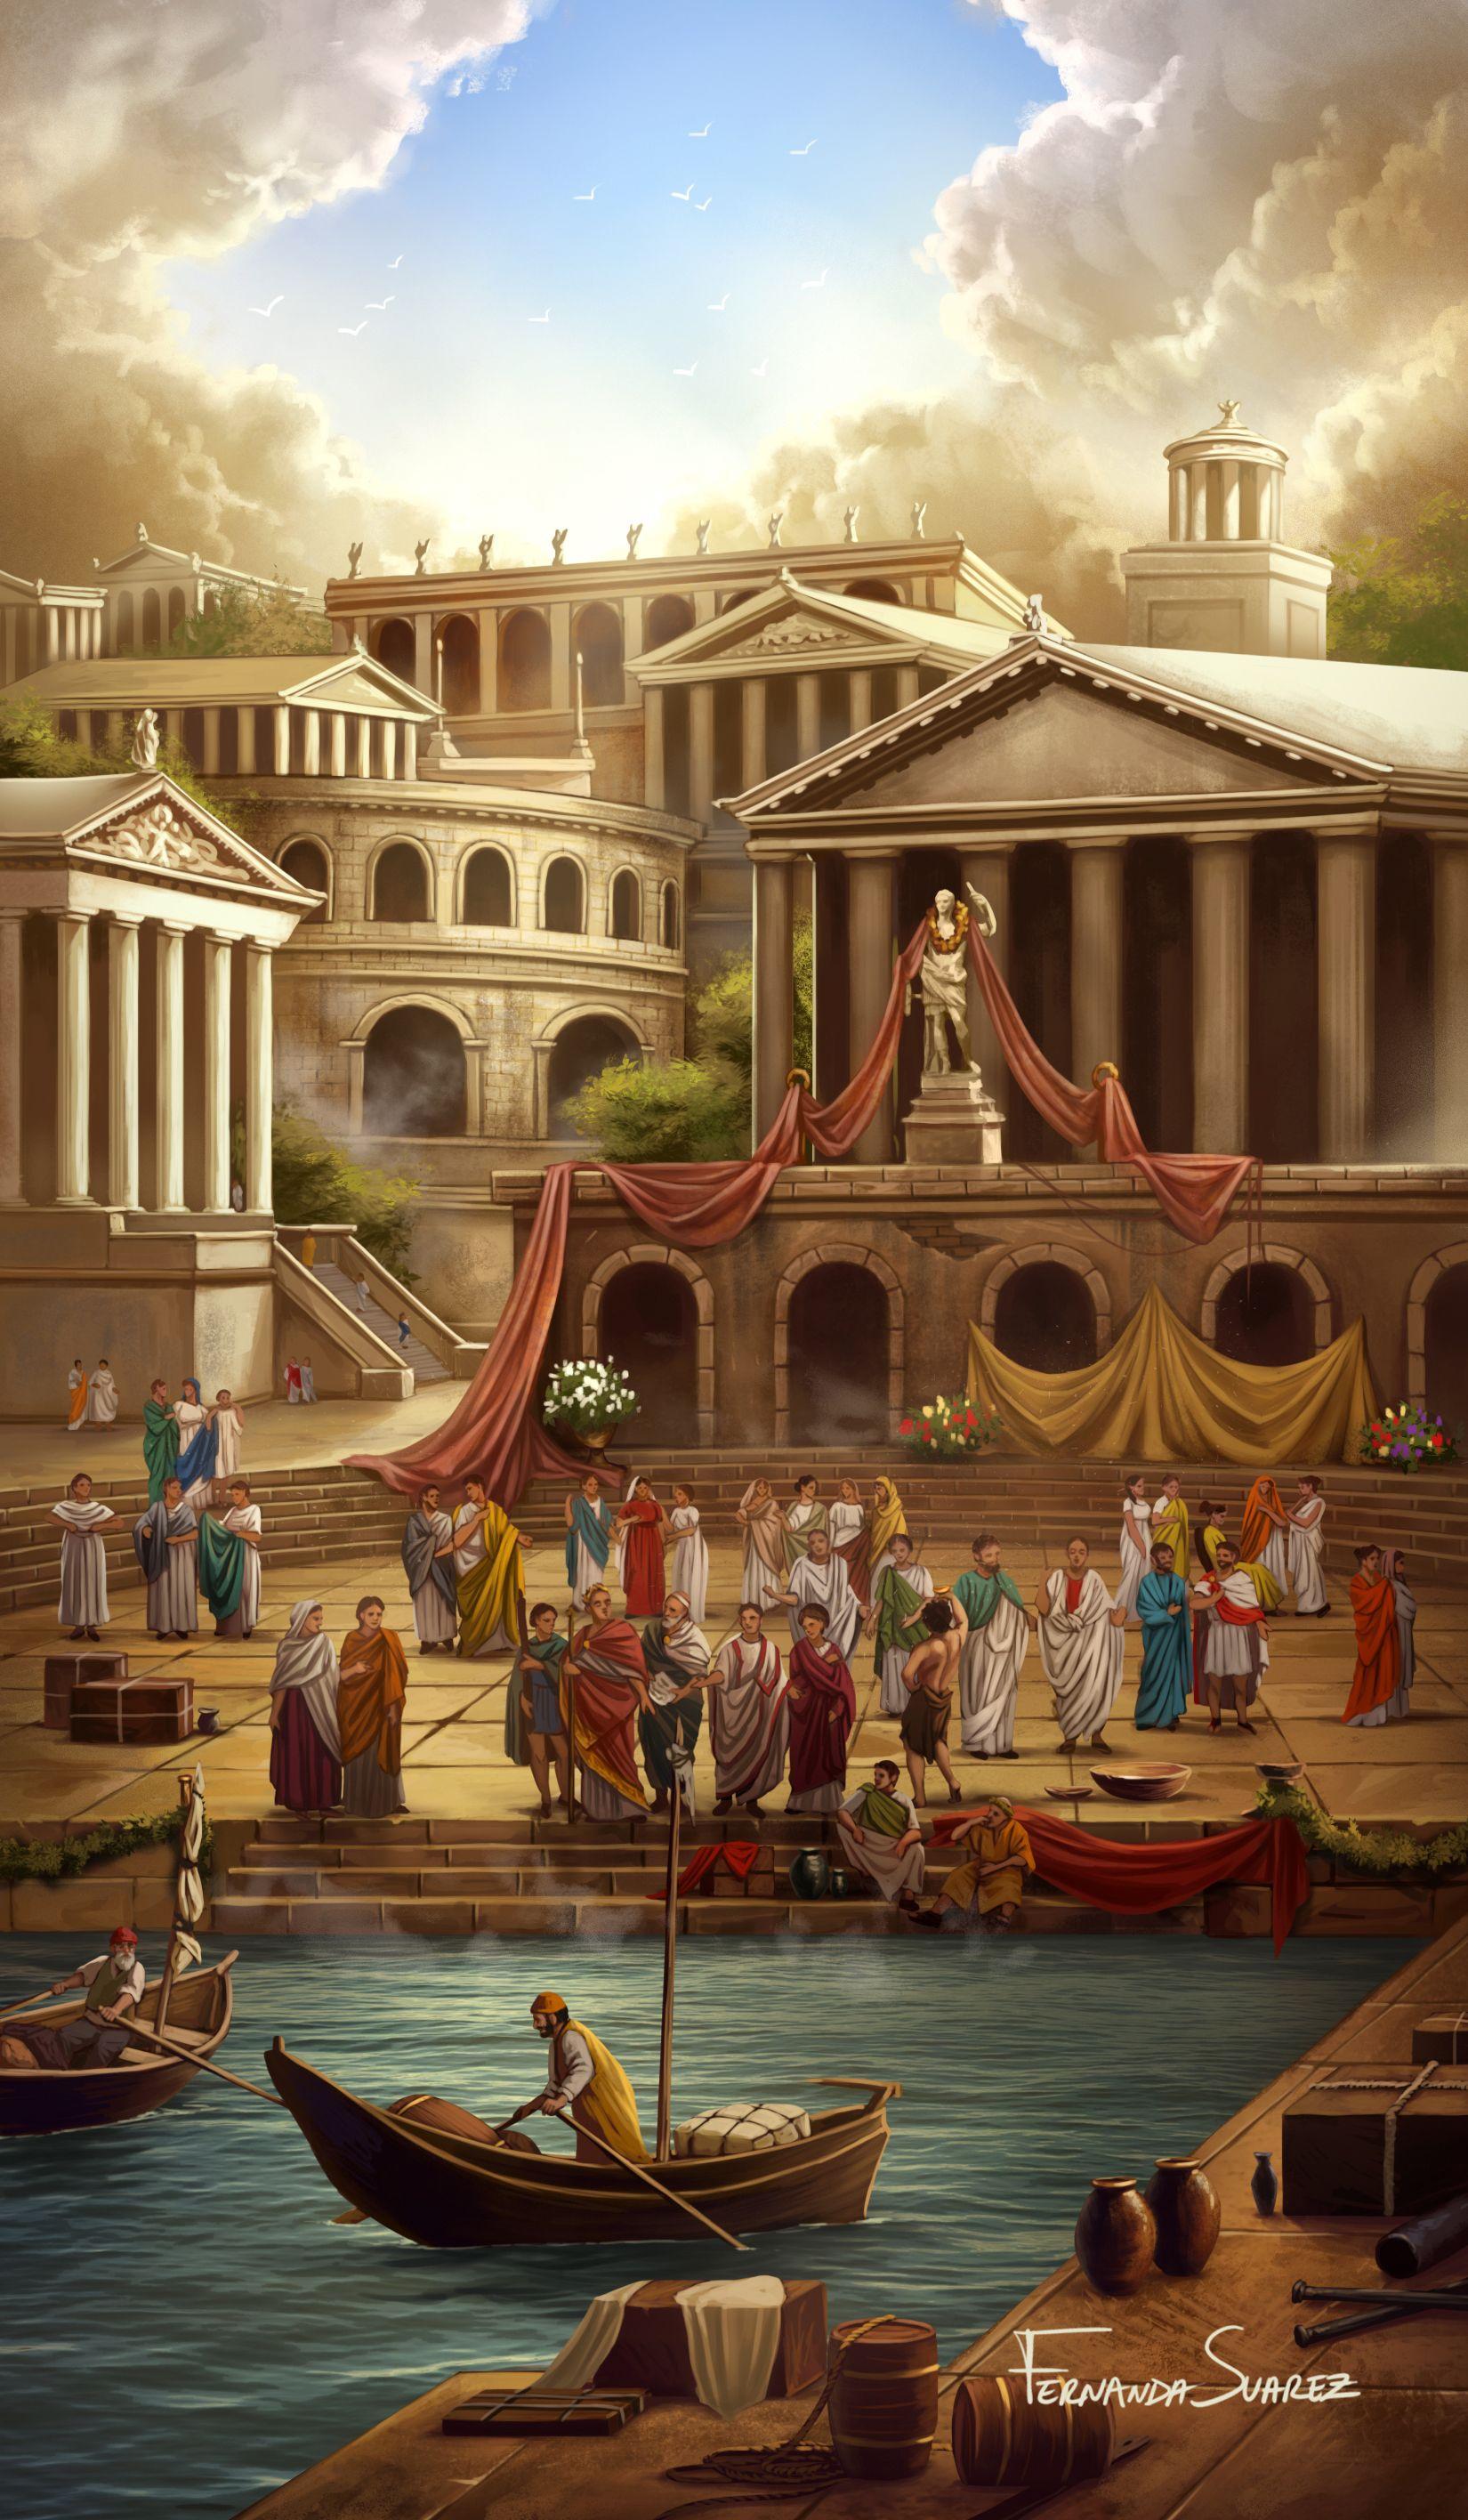 Rome by Fernanda Suarez | Rome art, Arabian art, Egypt art